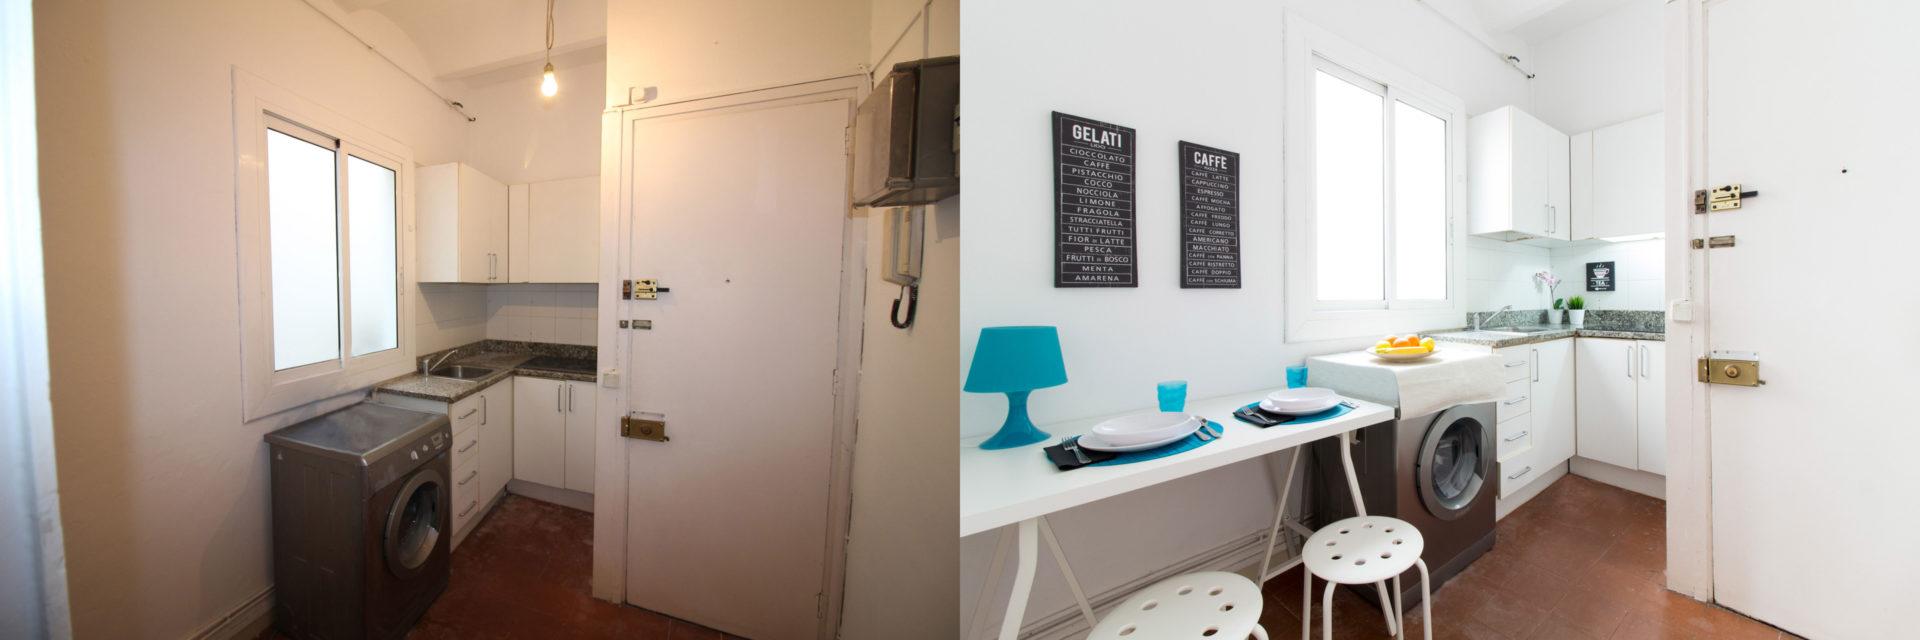 proyecto home staging cocina gracia barcelona